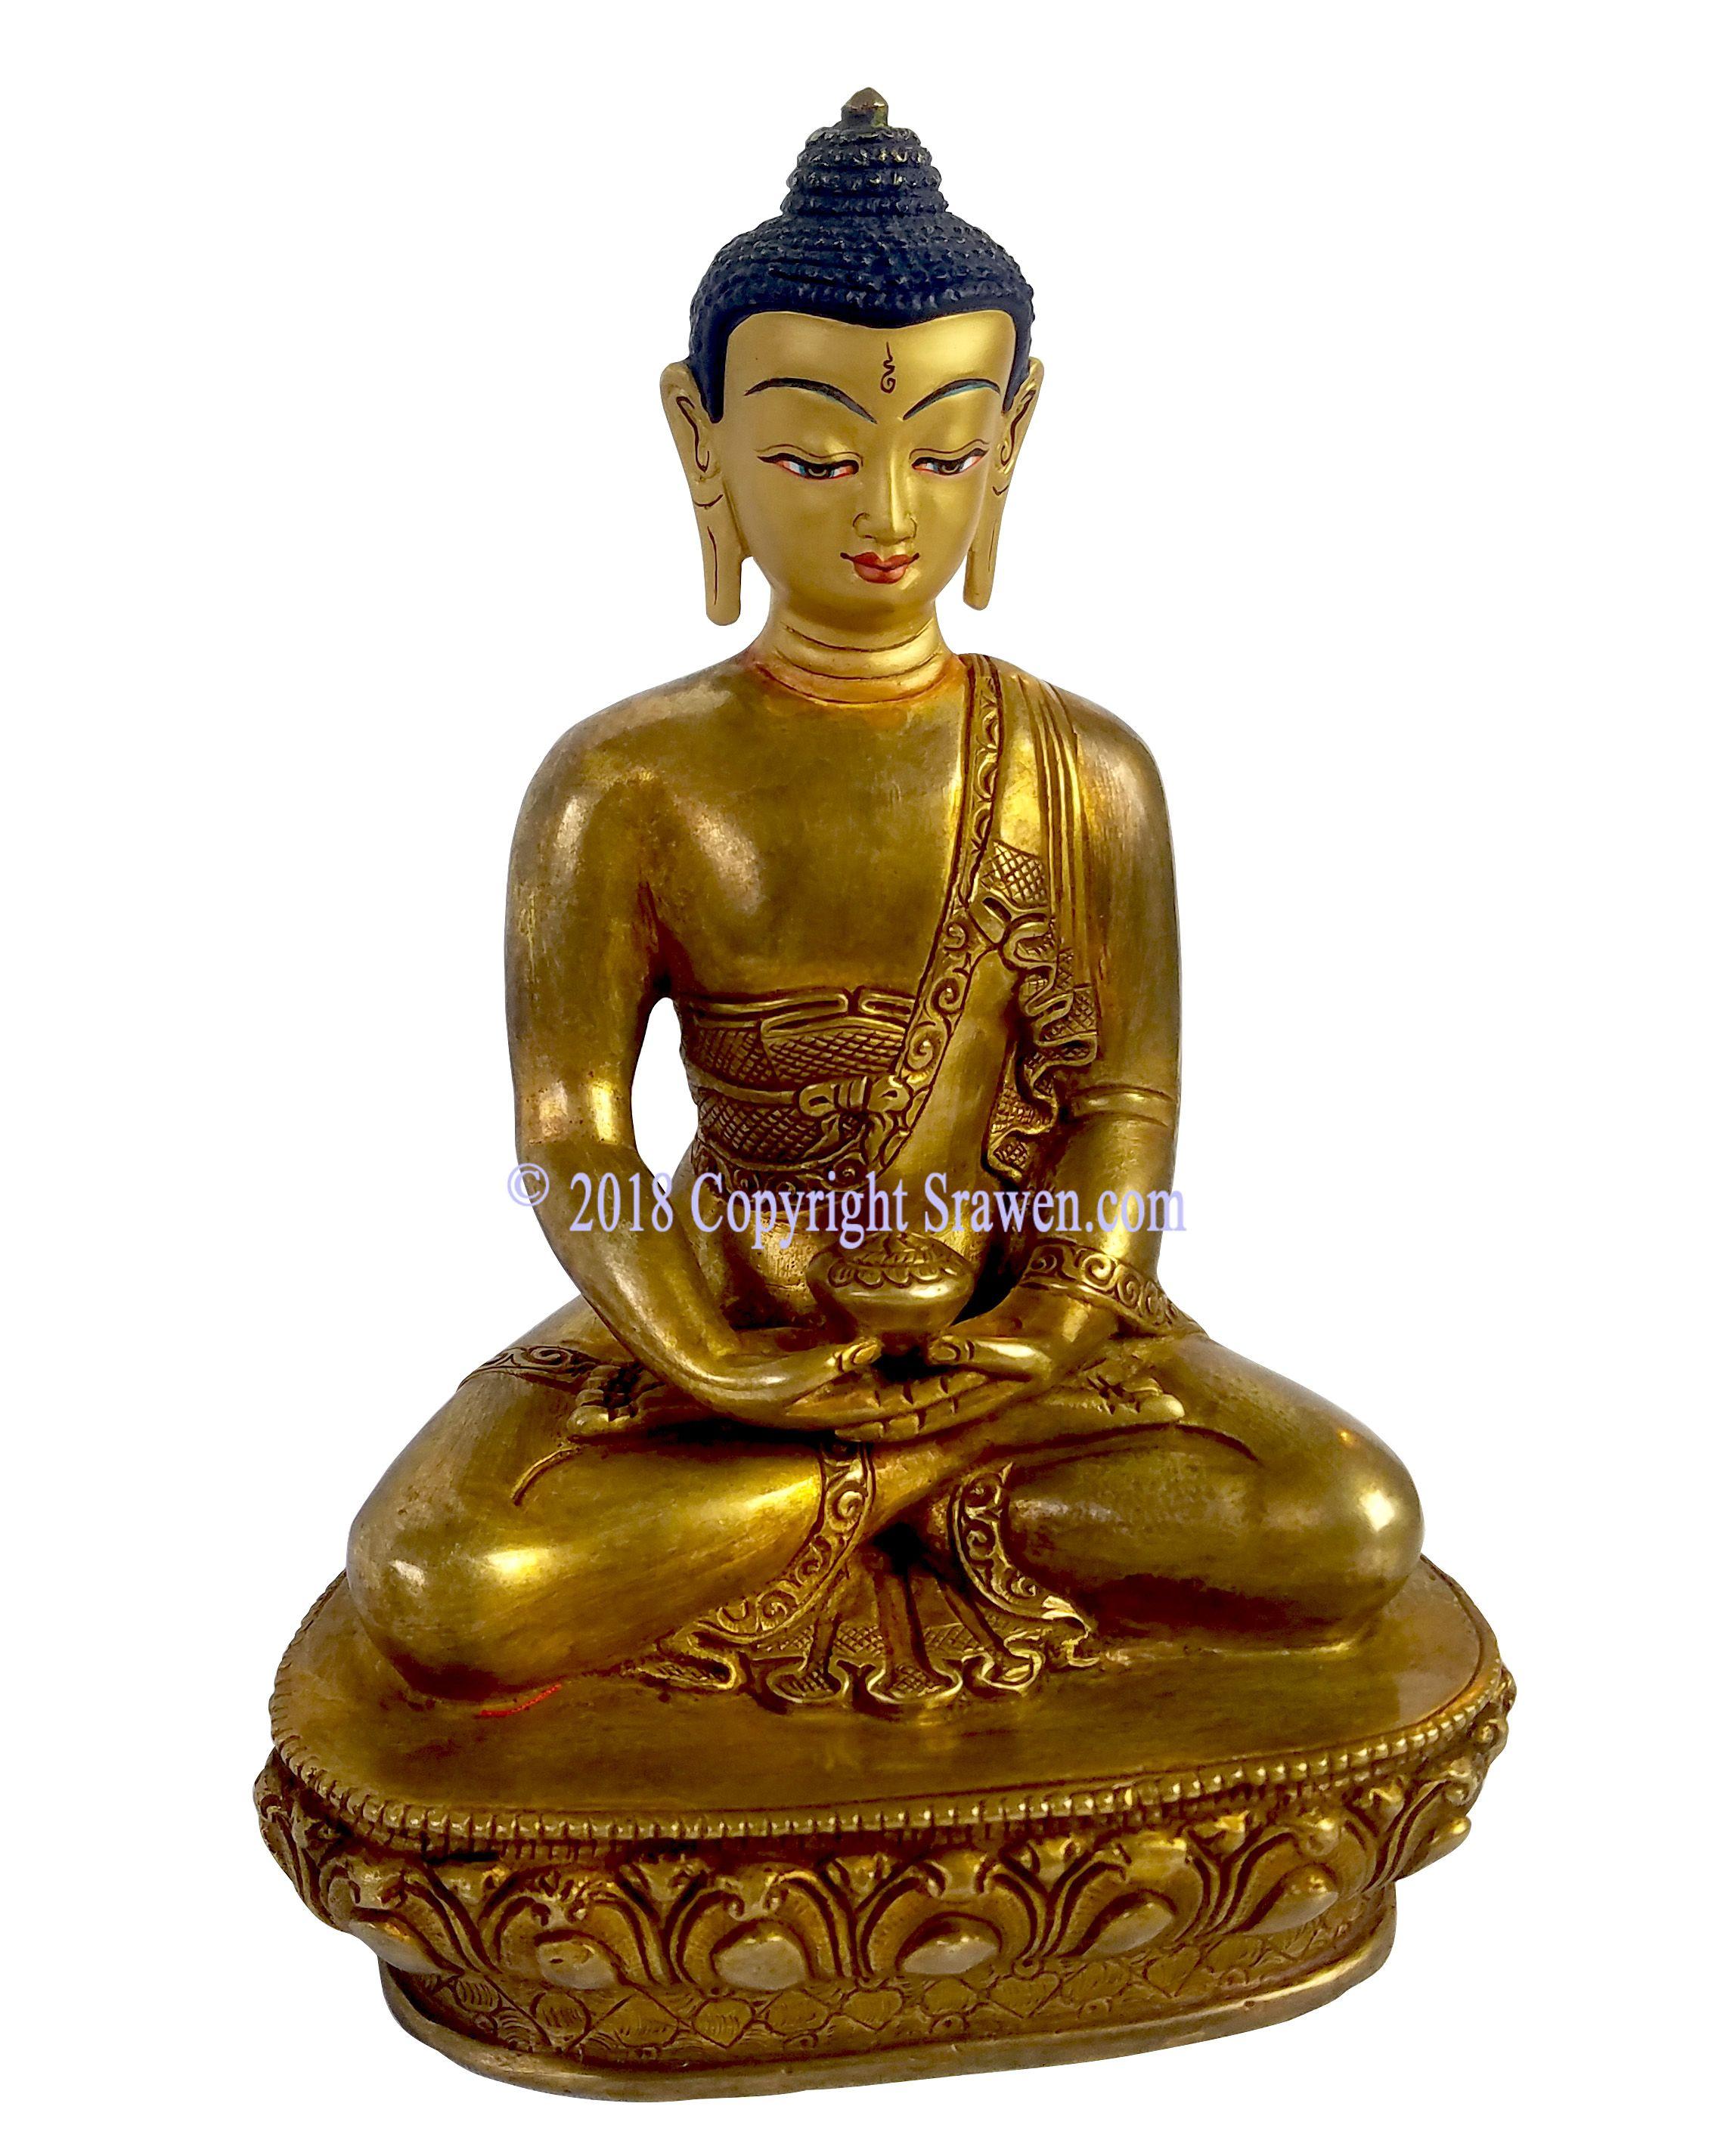 Gold Plated Bronze Buddha Statue